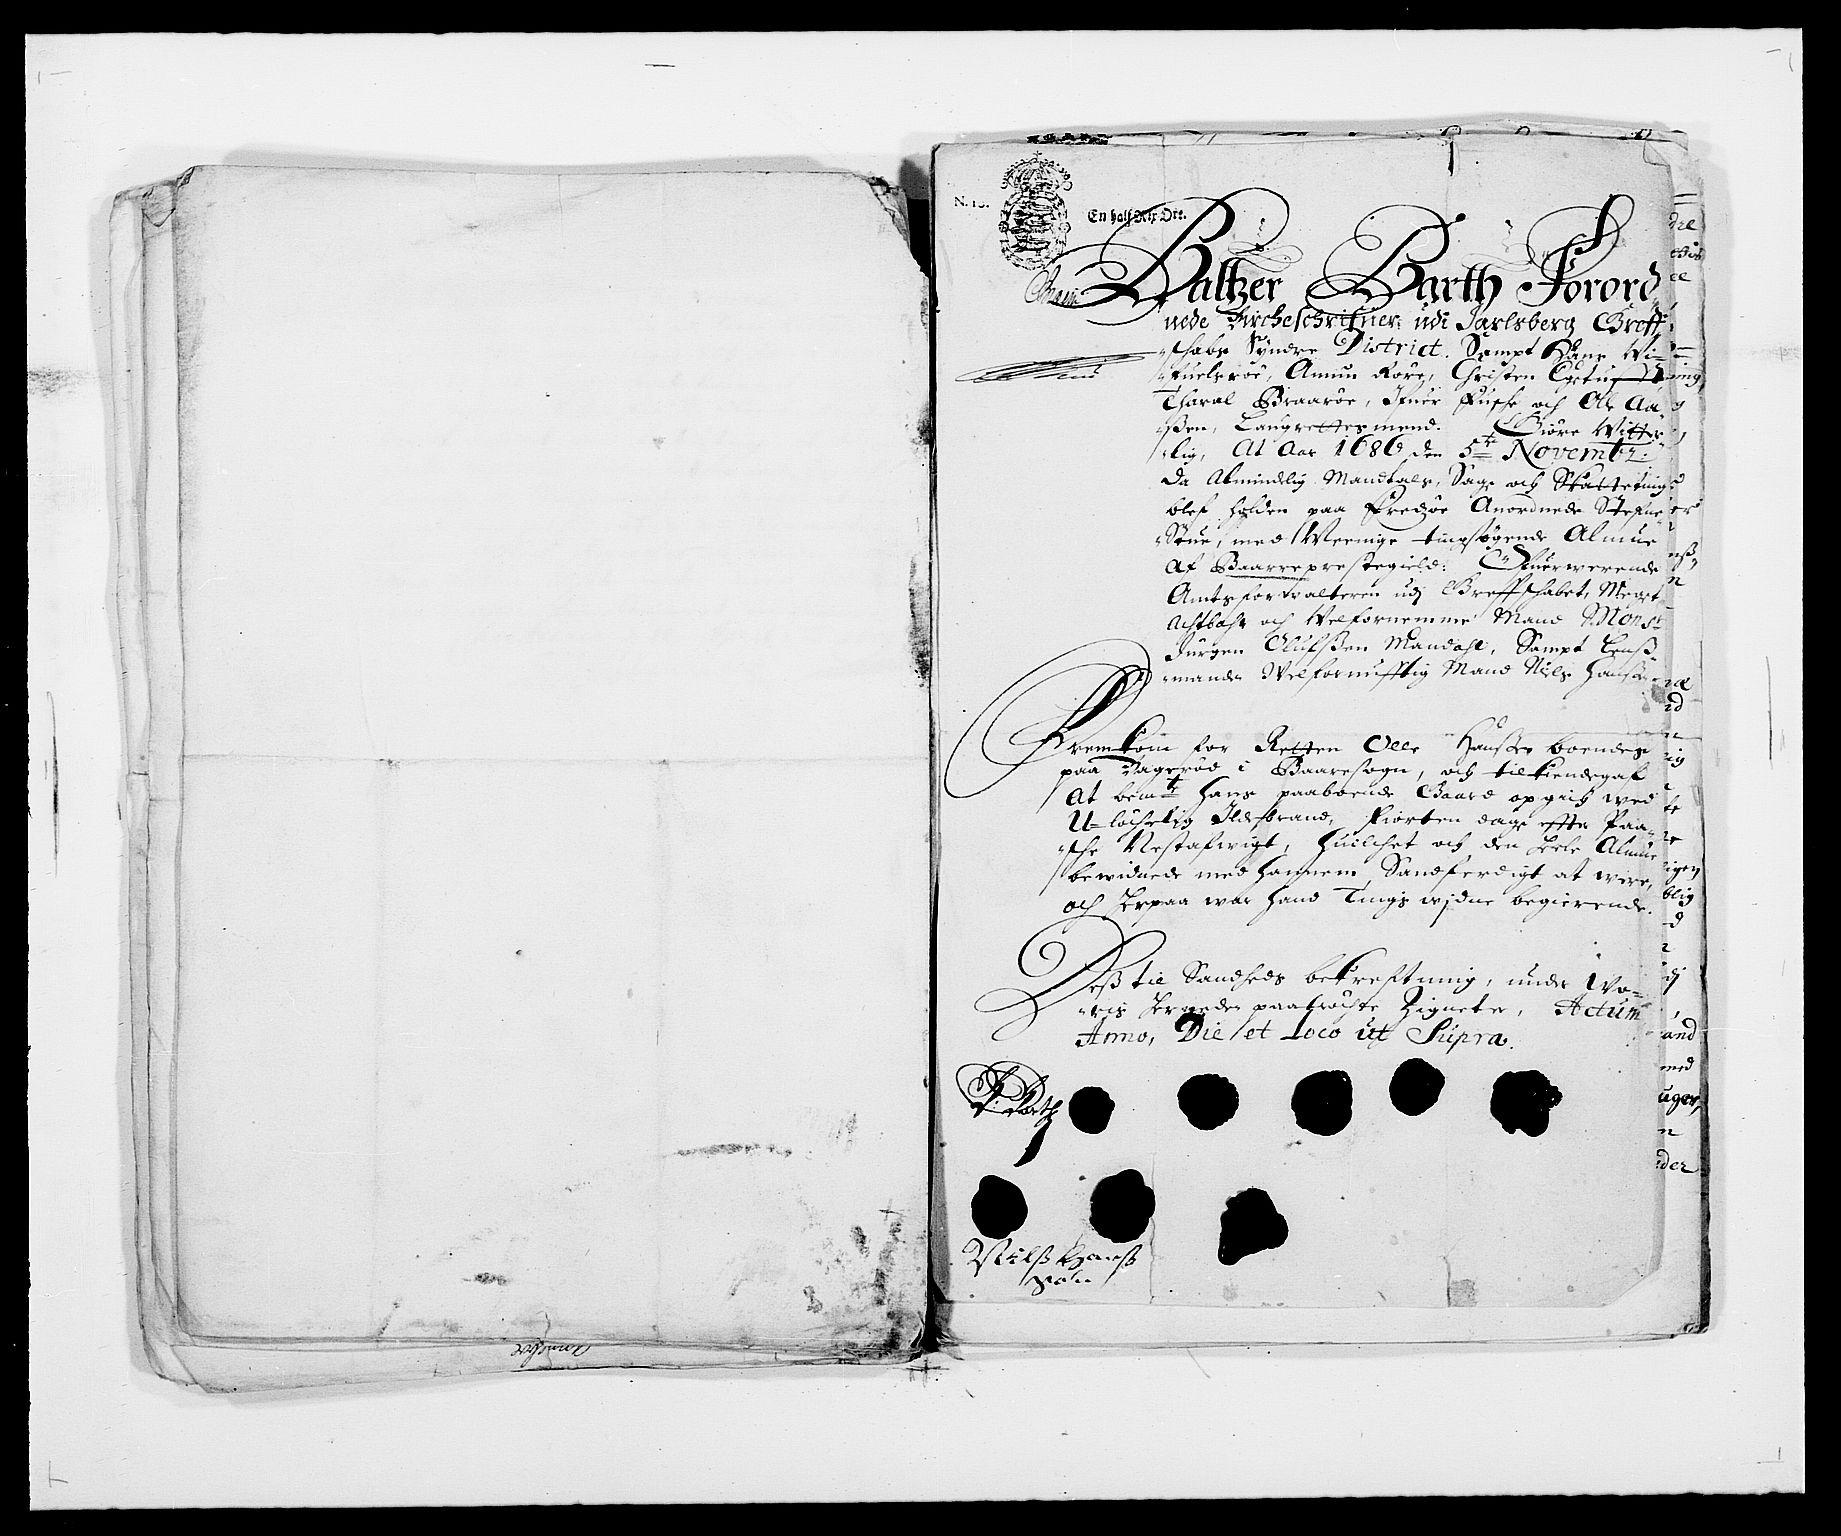 RA, Rentekammeret inntil 1814, Reviderte regnskaper, Fogderegnskap, R32/L1857: Fogderegnskap Jarlsberg grevskap, 1686-1690, s. 513